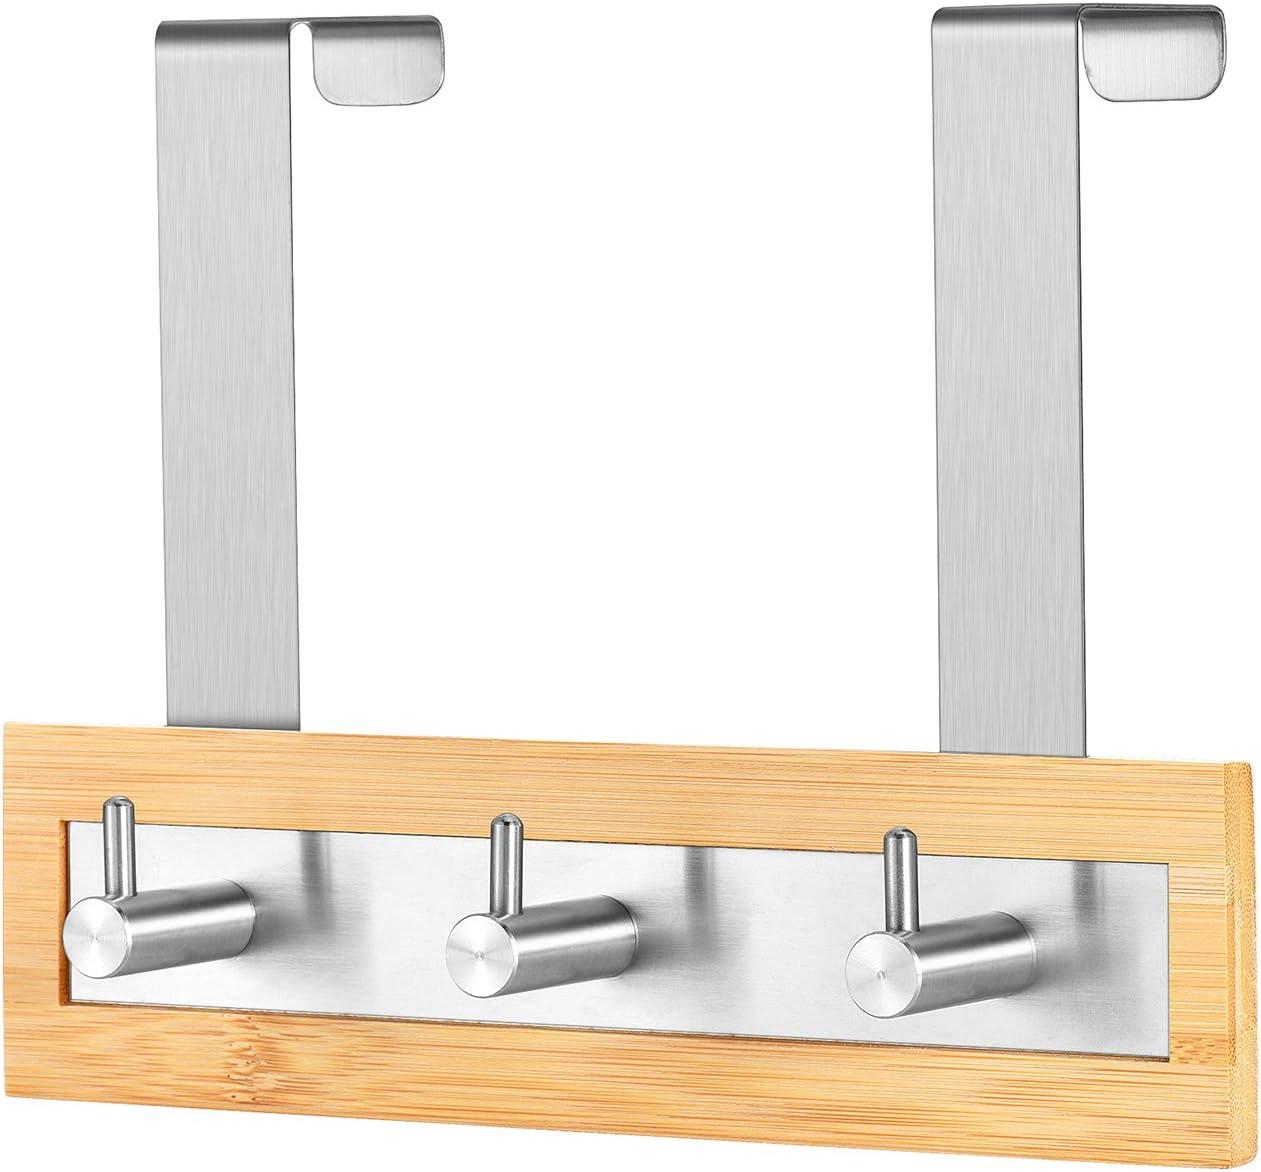 ToiletTree Bamboo Wood and Stainless Steel Door Hanging Towel Rack